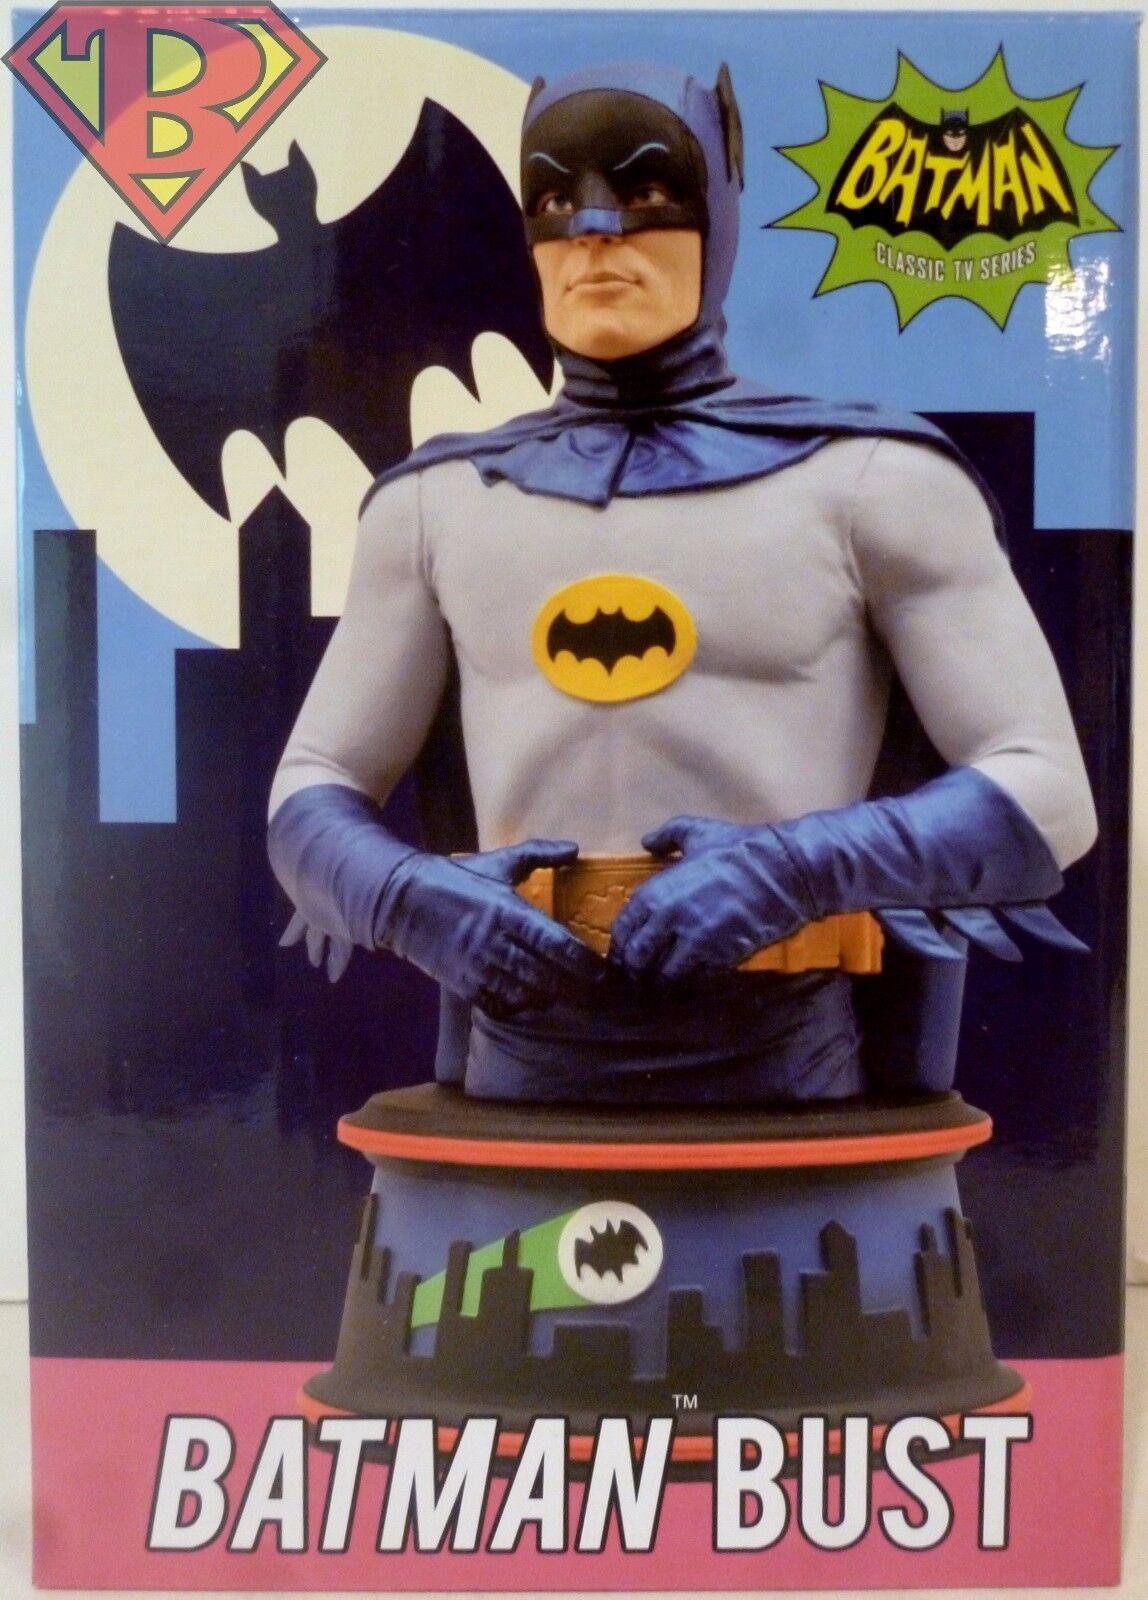 BATMAN (ADAM WEST) 1966 TV Series 6